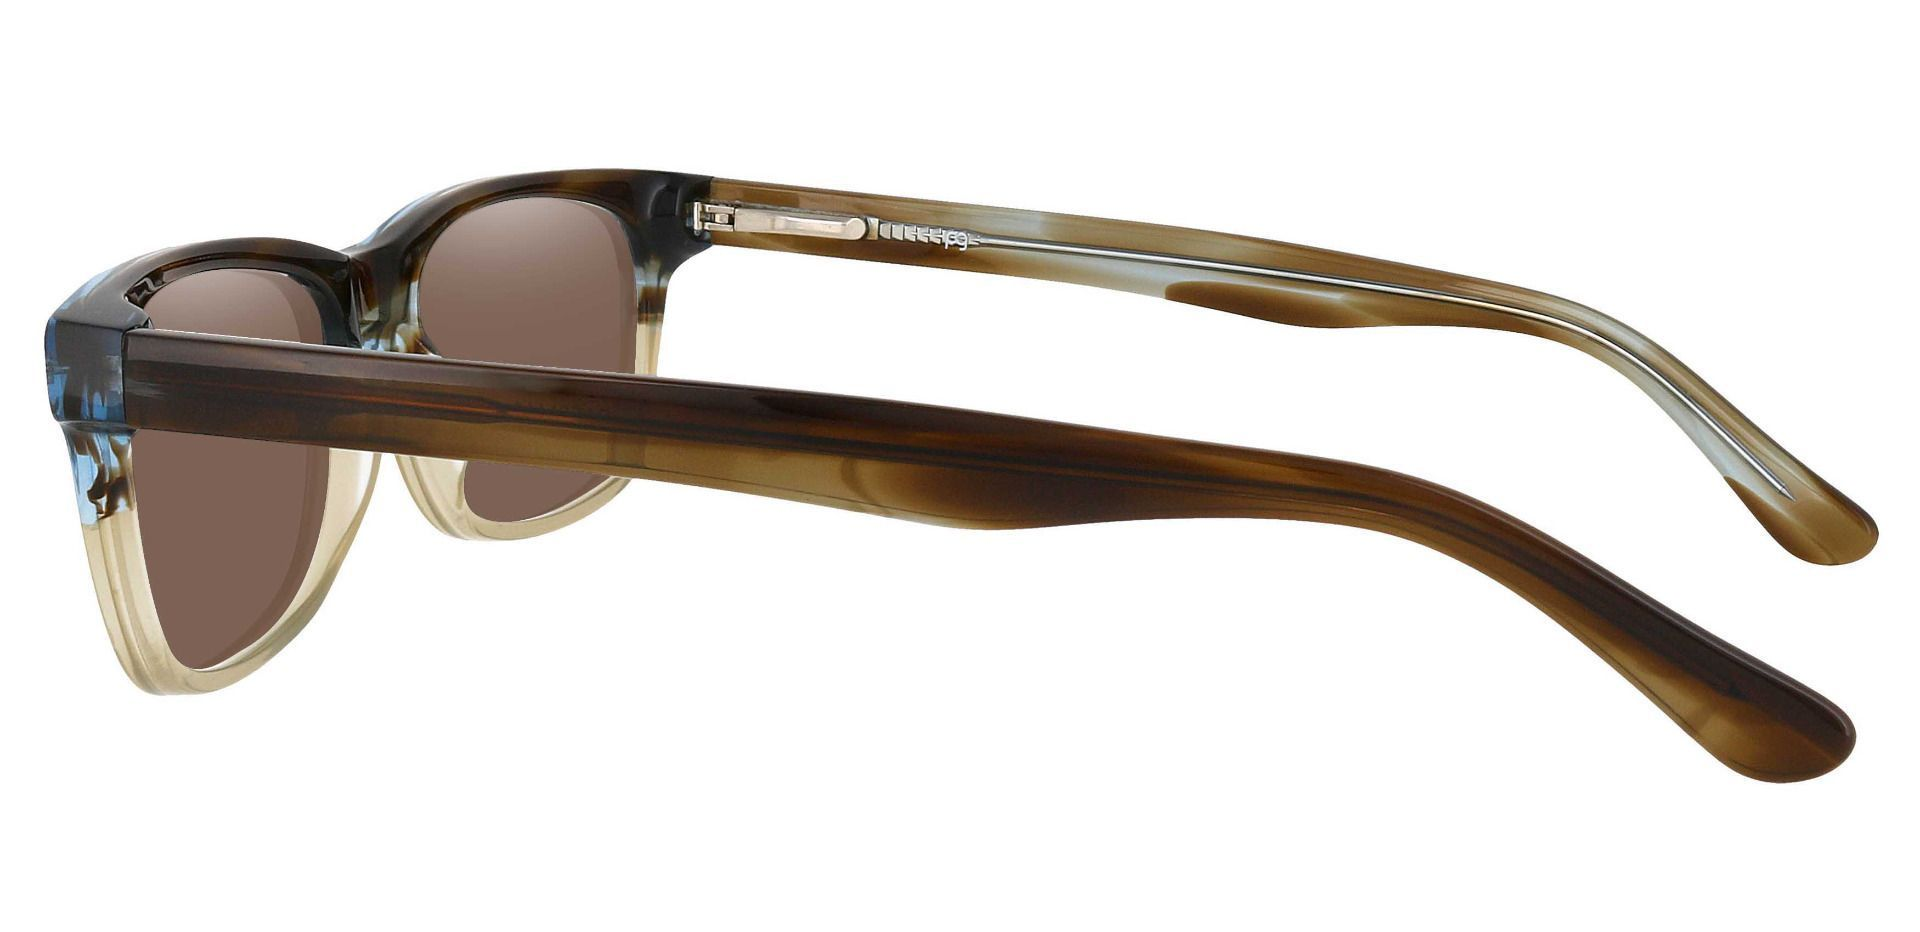 Hendrix Rectangle Prescription Sunglasses - Multi Color Frame With Brown Lenses